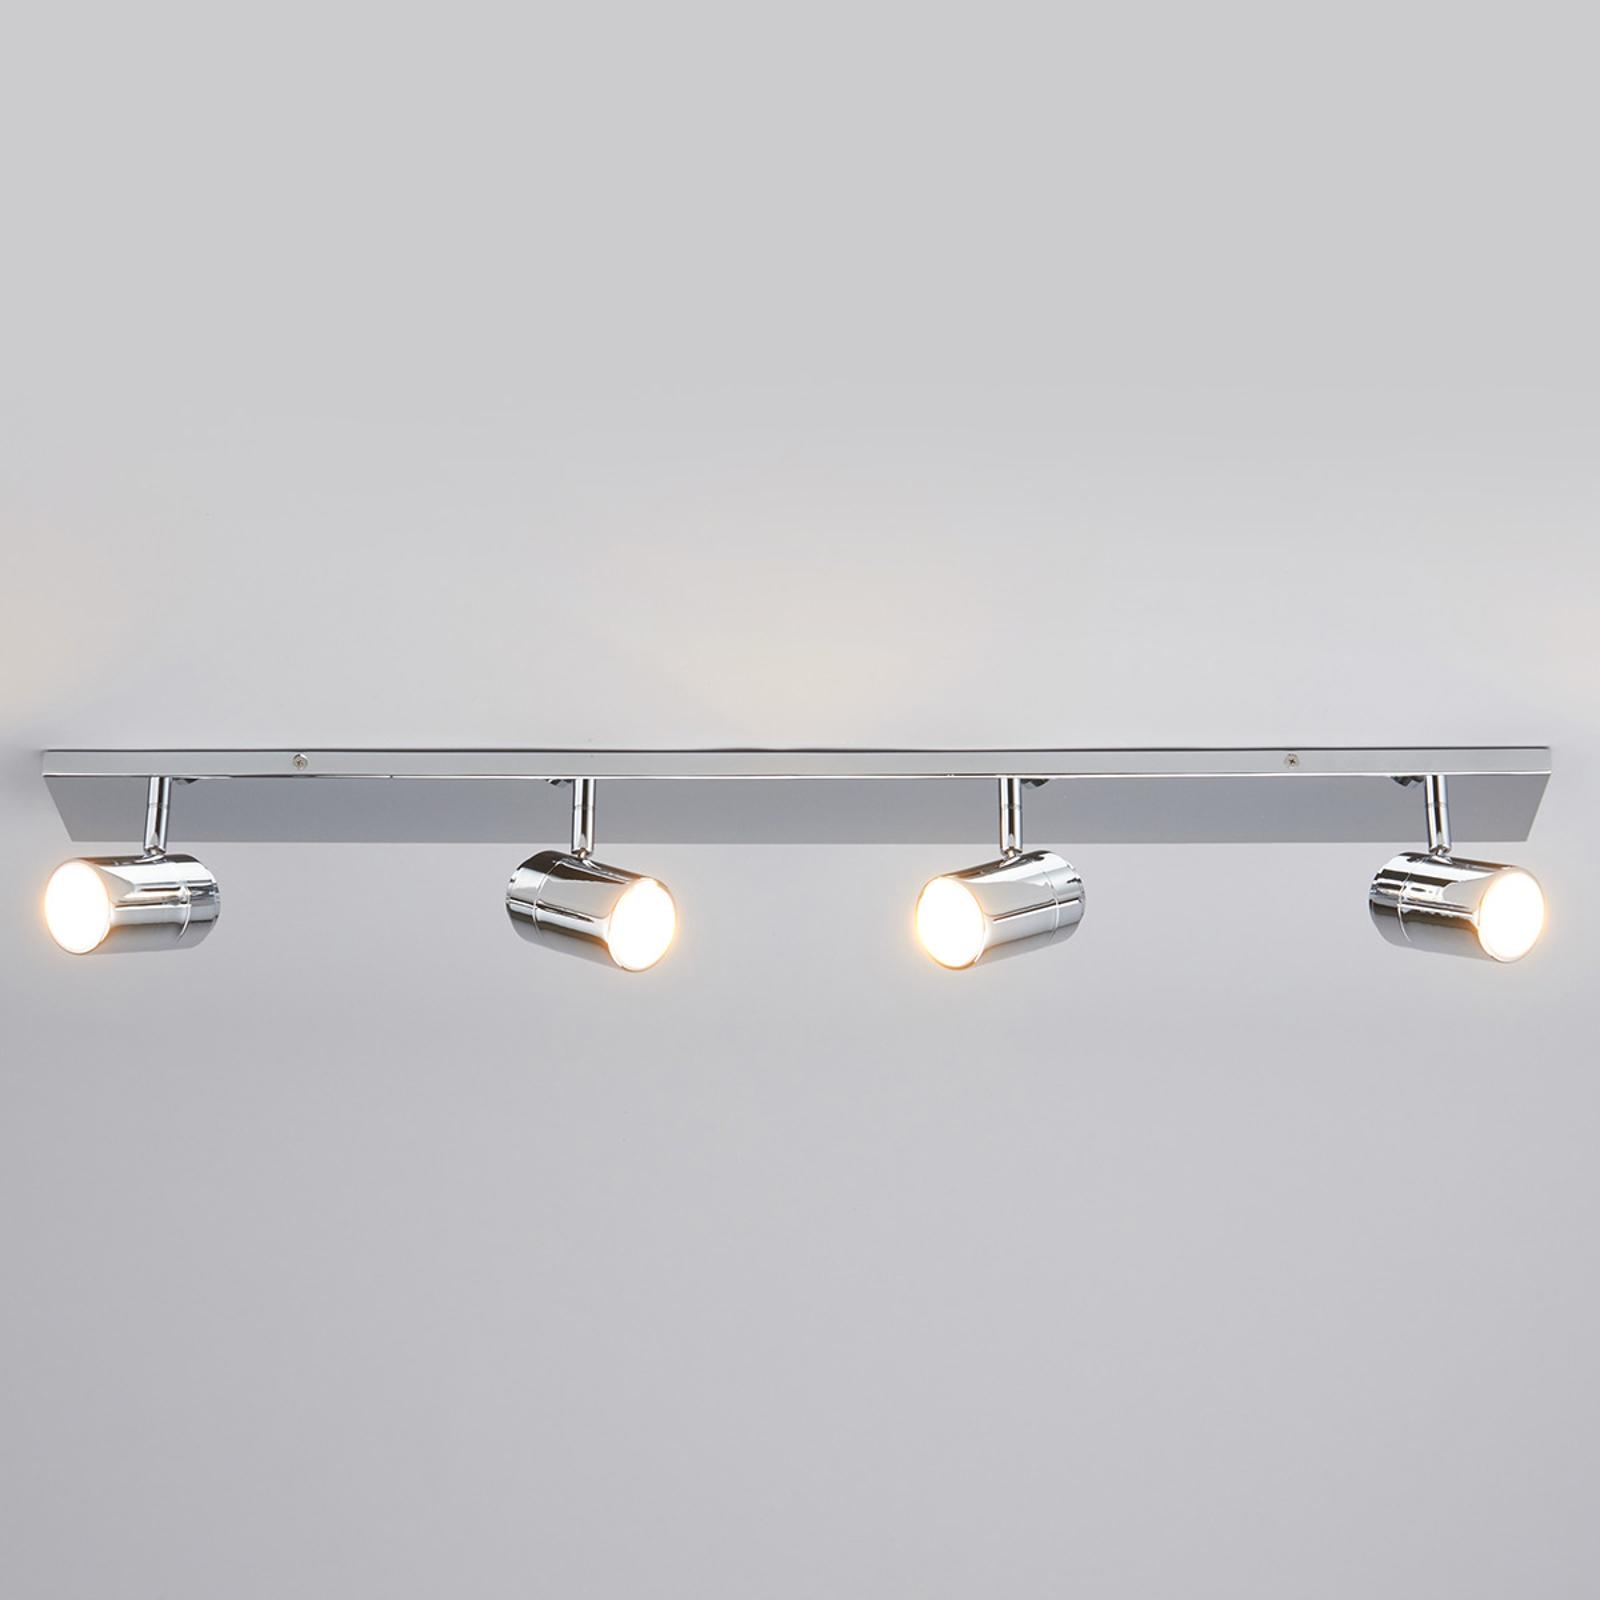 Dejan - 4-punktowa łazienkowa lampa sufitowa